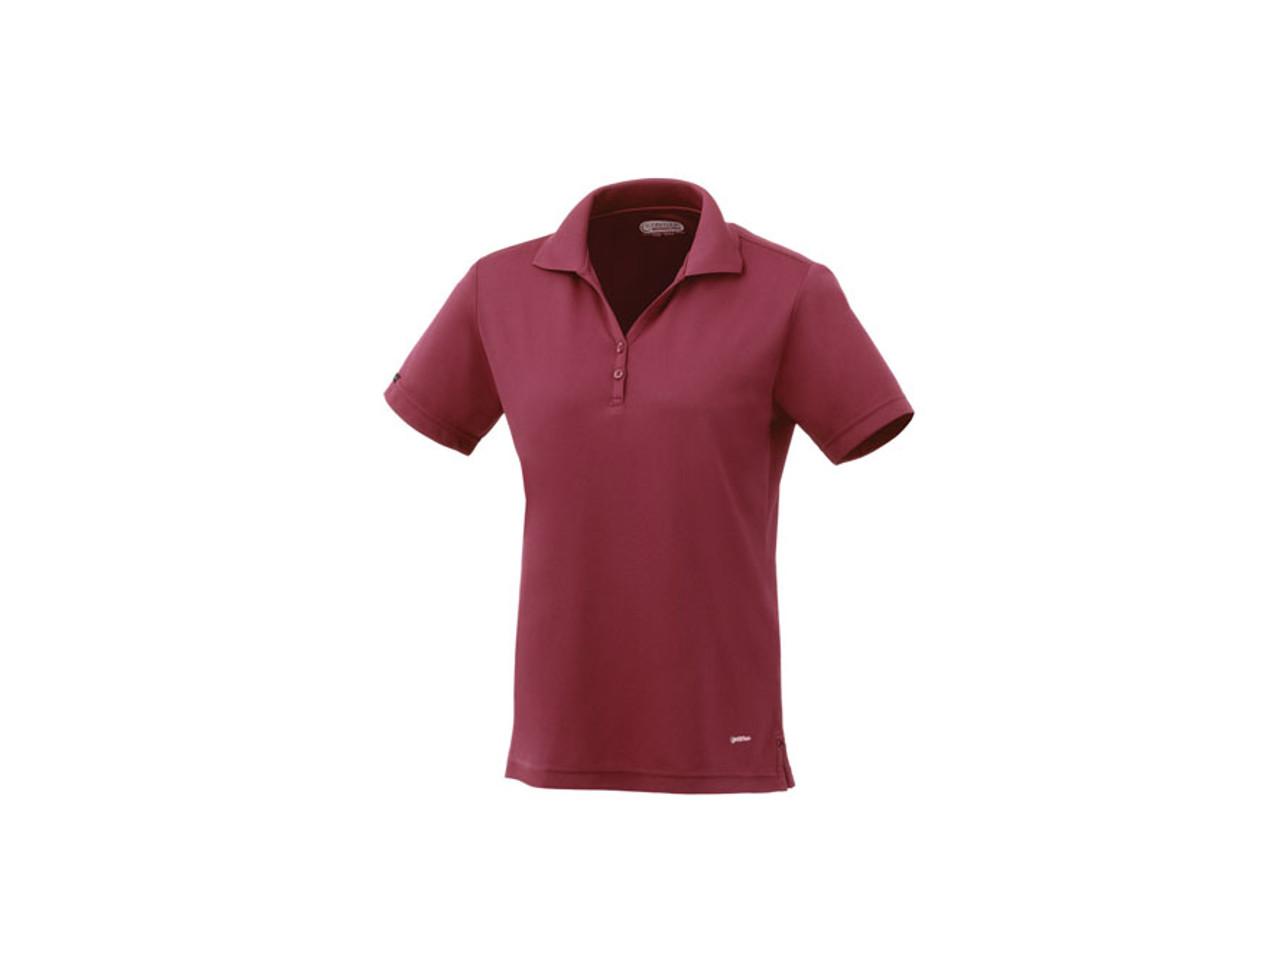 ... Maroon On Tour 96252 Women s Moreno Short Sleeve Polo Shirt  d826d568ba